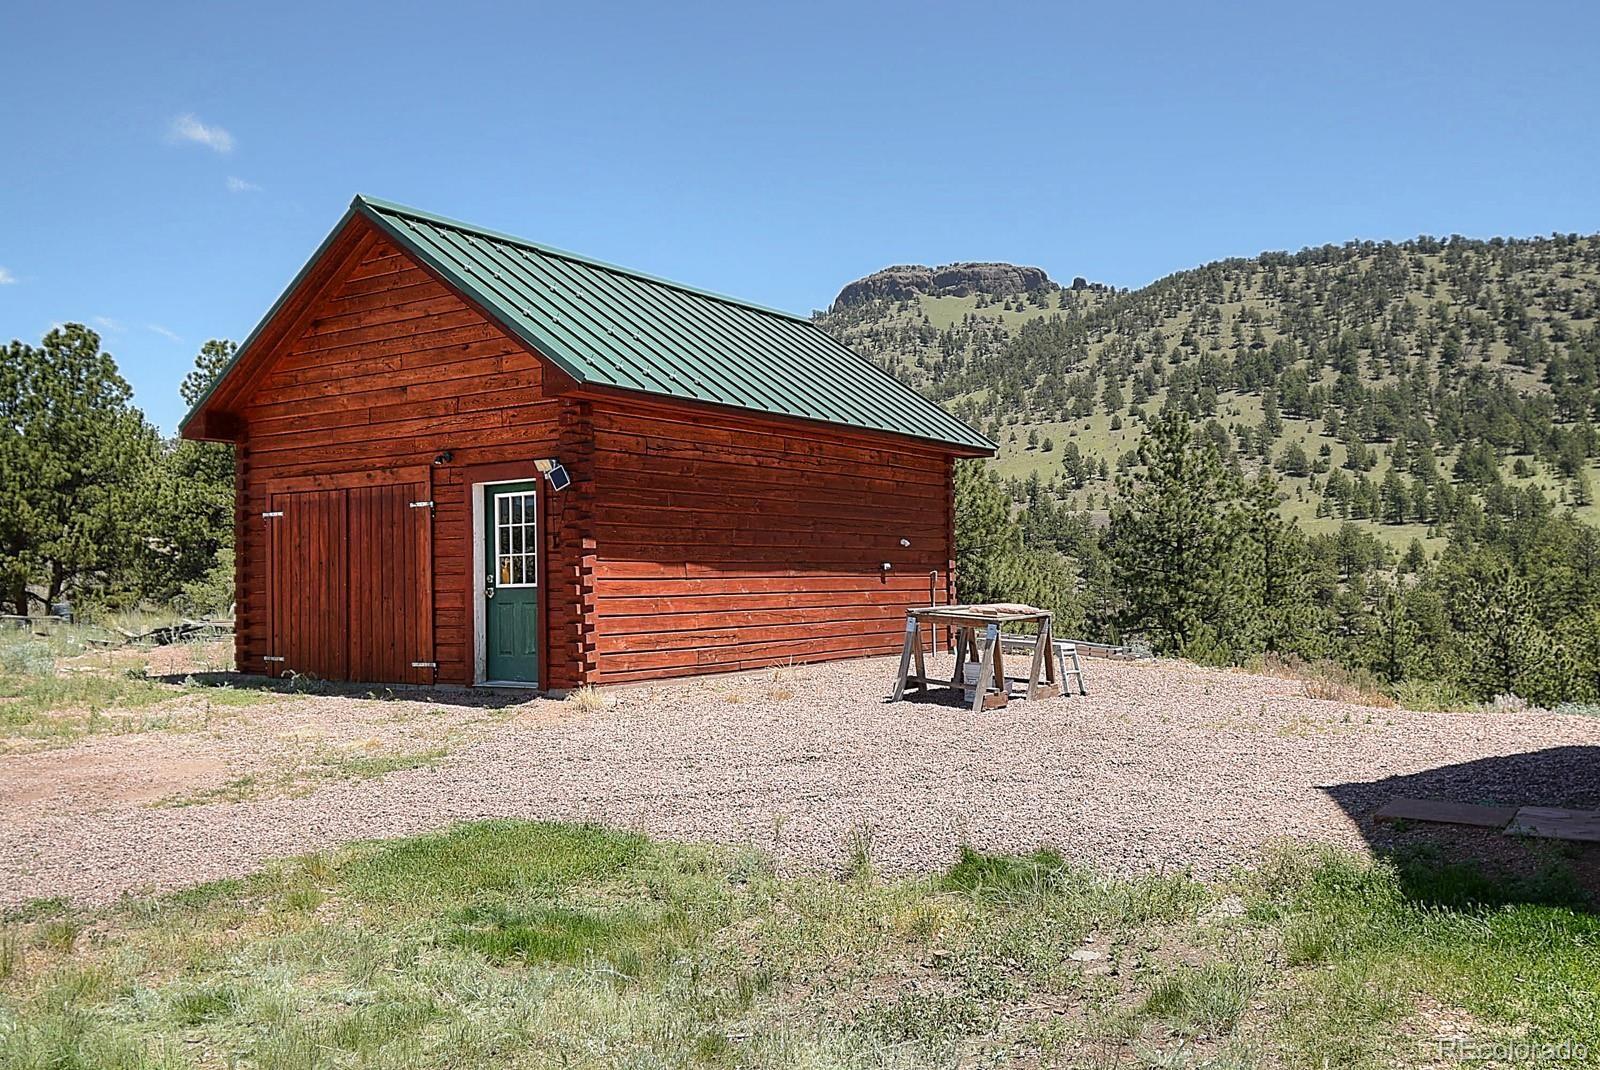 MLS# 8182693 - 7 - 396 Eagle Nest Trail, Guffey, CO 80820